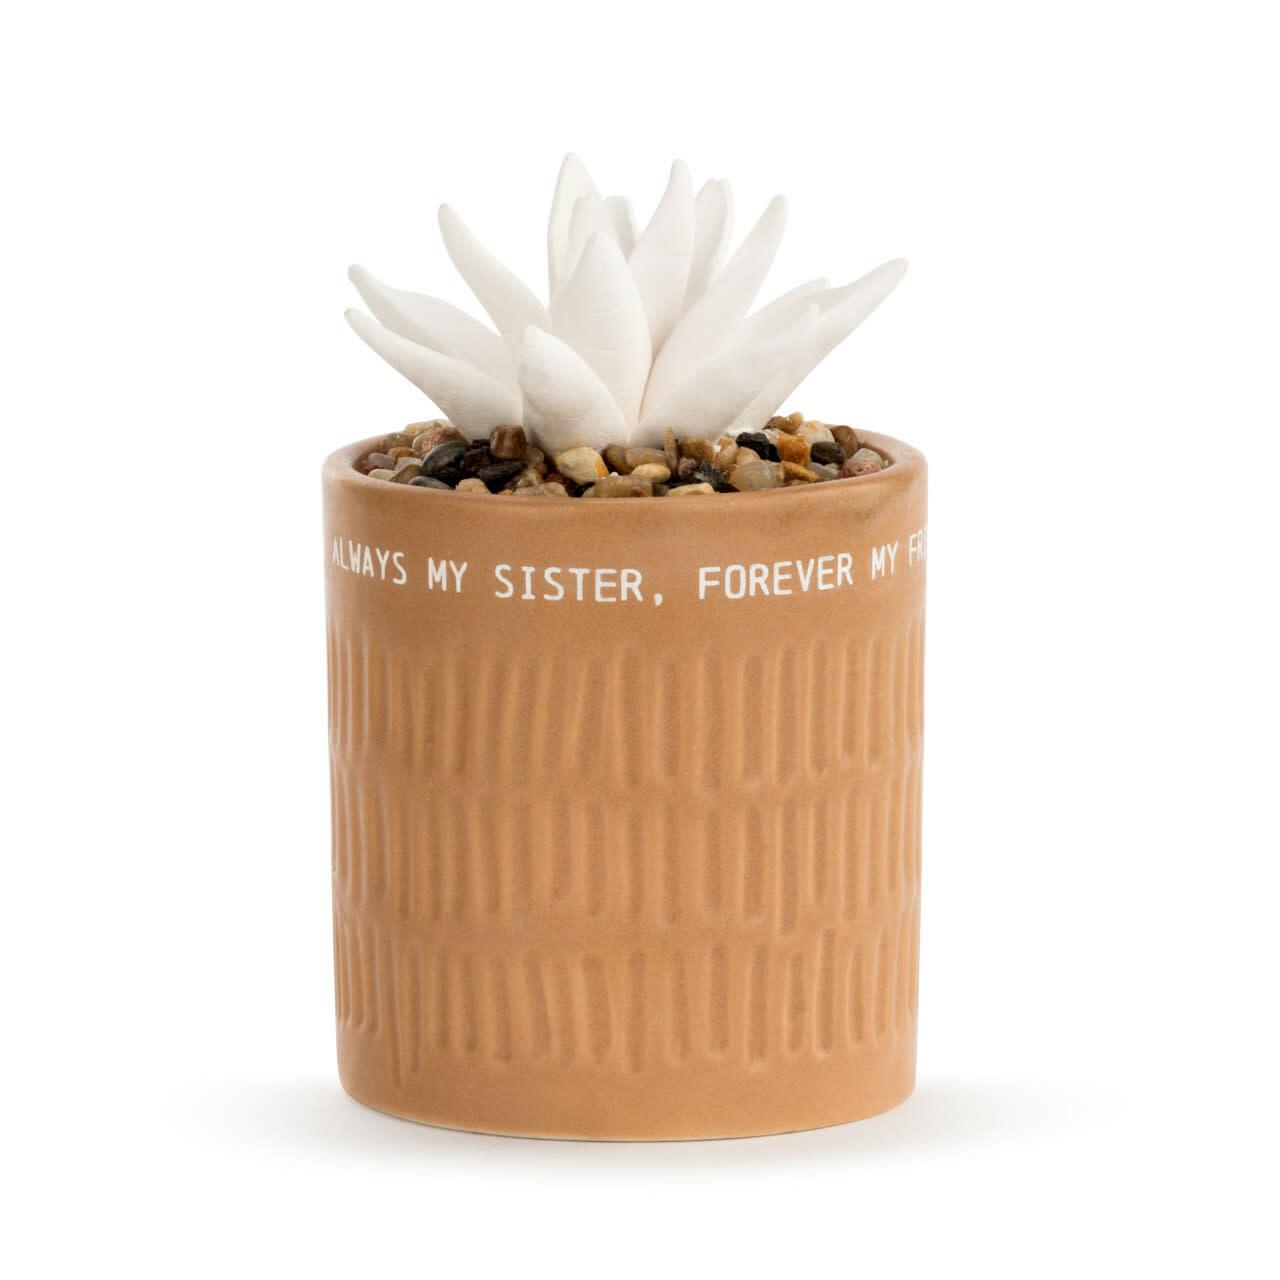 Demdaco Succulent Oil Diffuser - My Sister